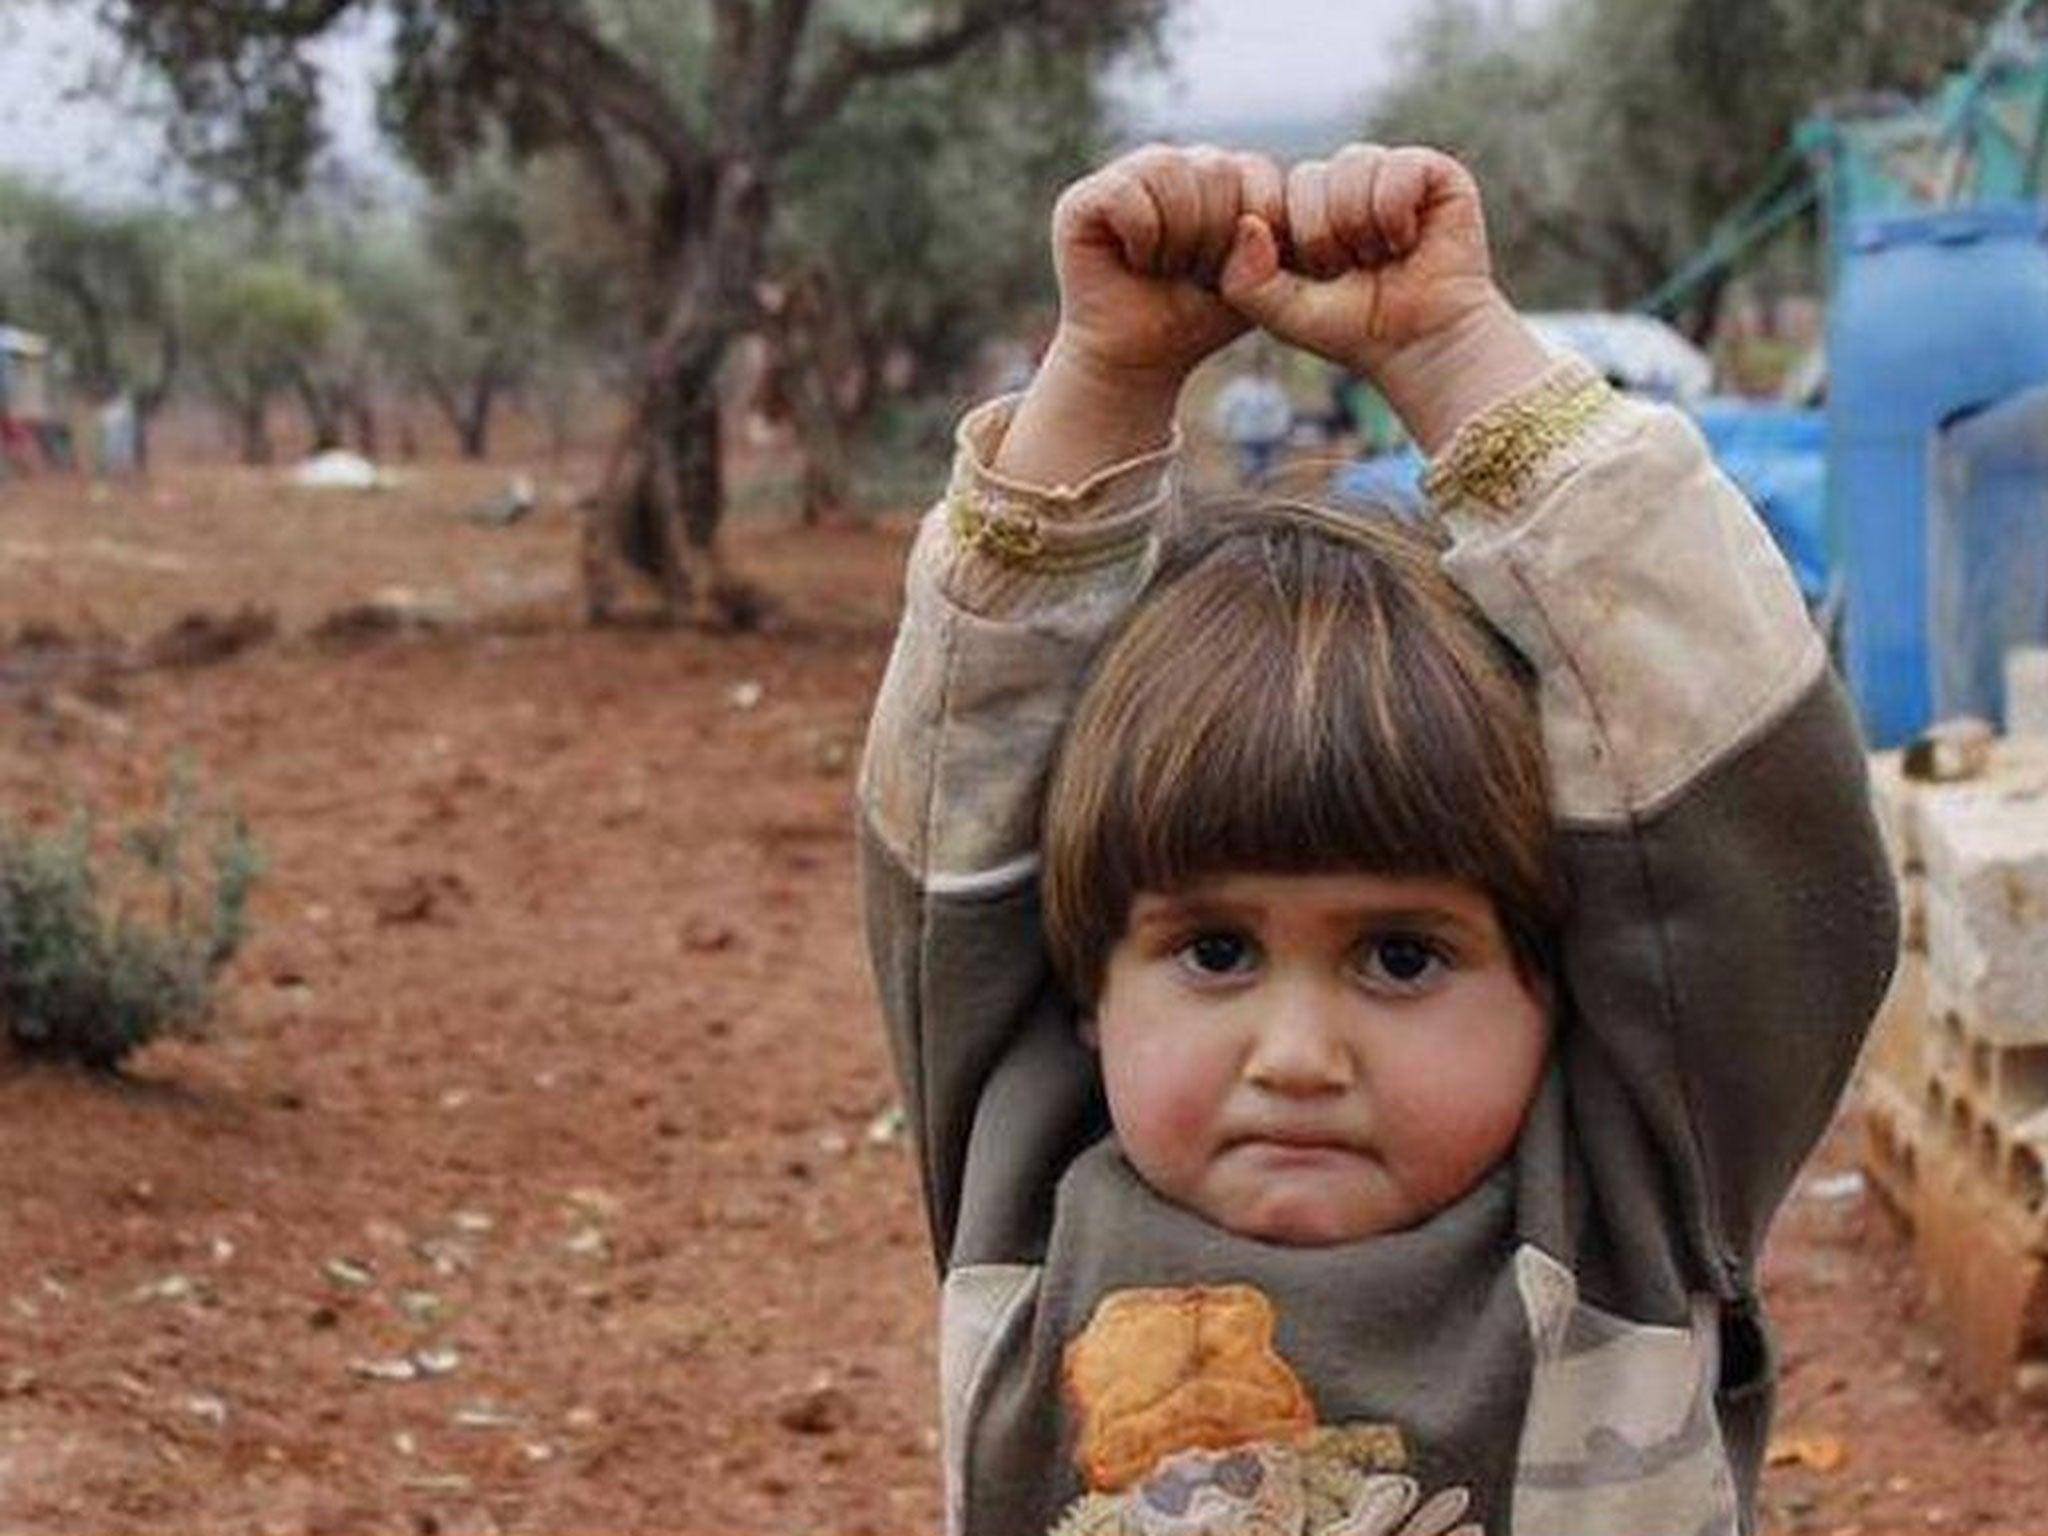 https://static.independent.co.uk/s3fs-public/thumbnails/image/2015/03/31/12/Syria-child2.jpg